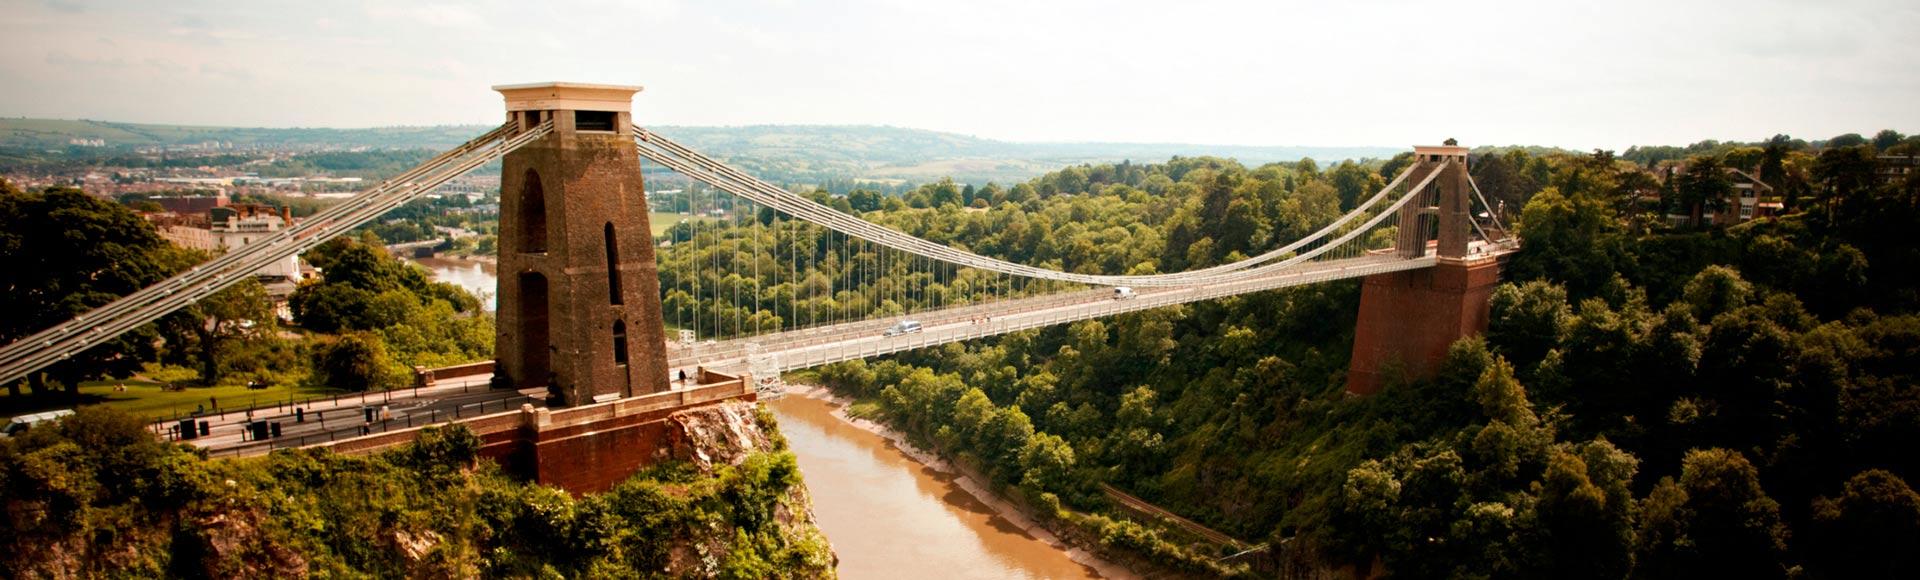 Cursos de inglés en Bristol 2017 – Curso de inglés en el extranjero